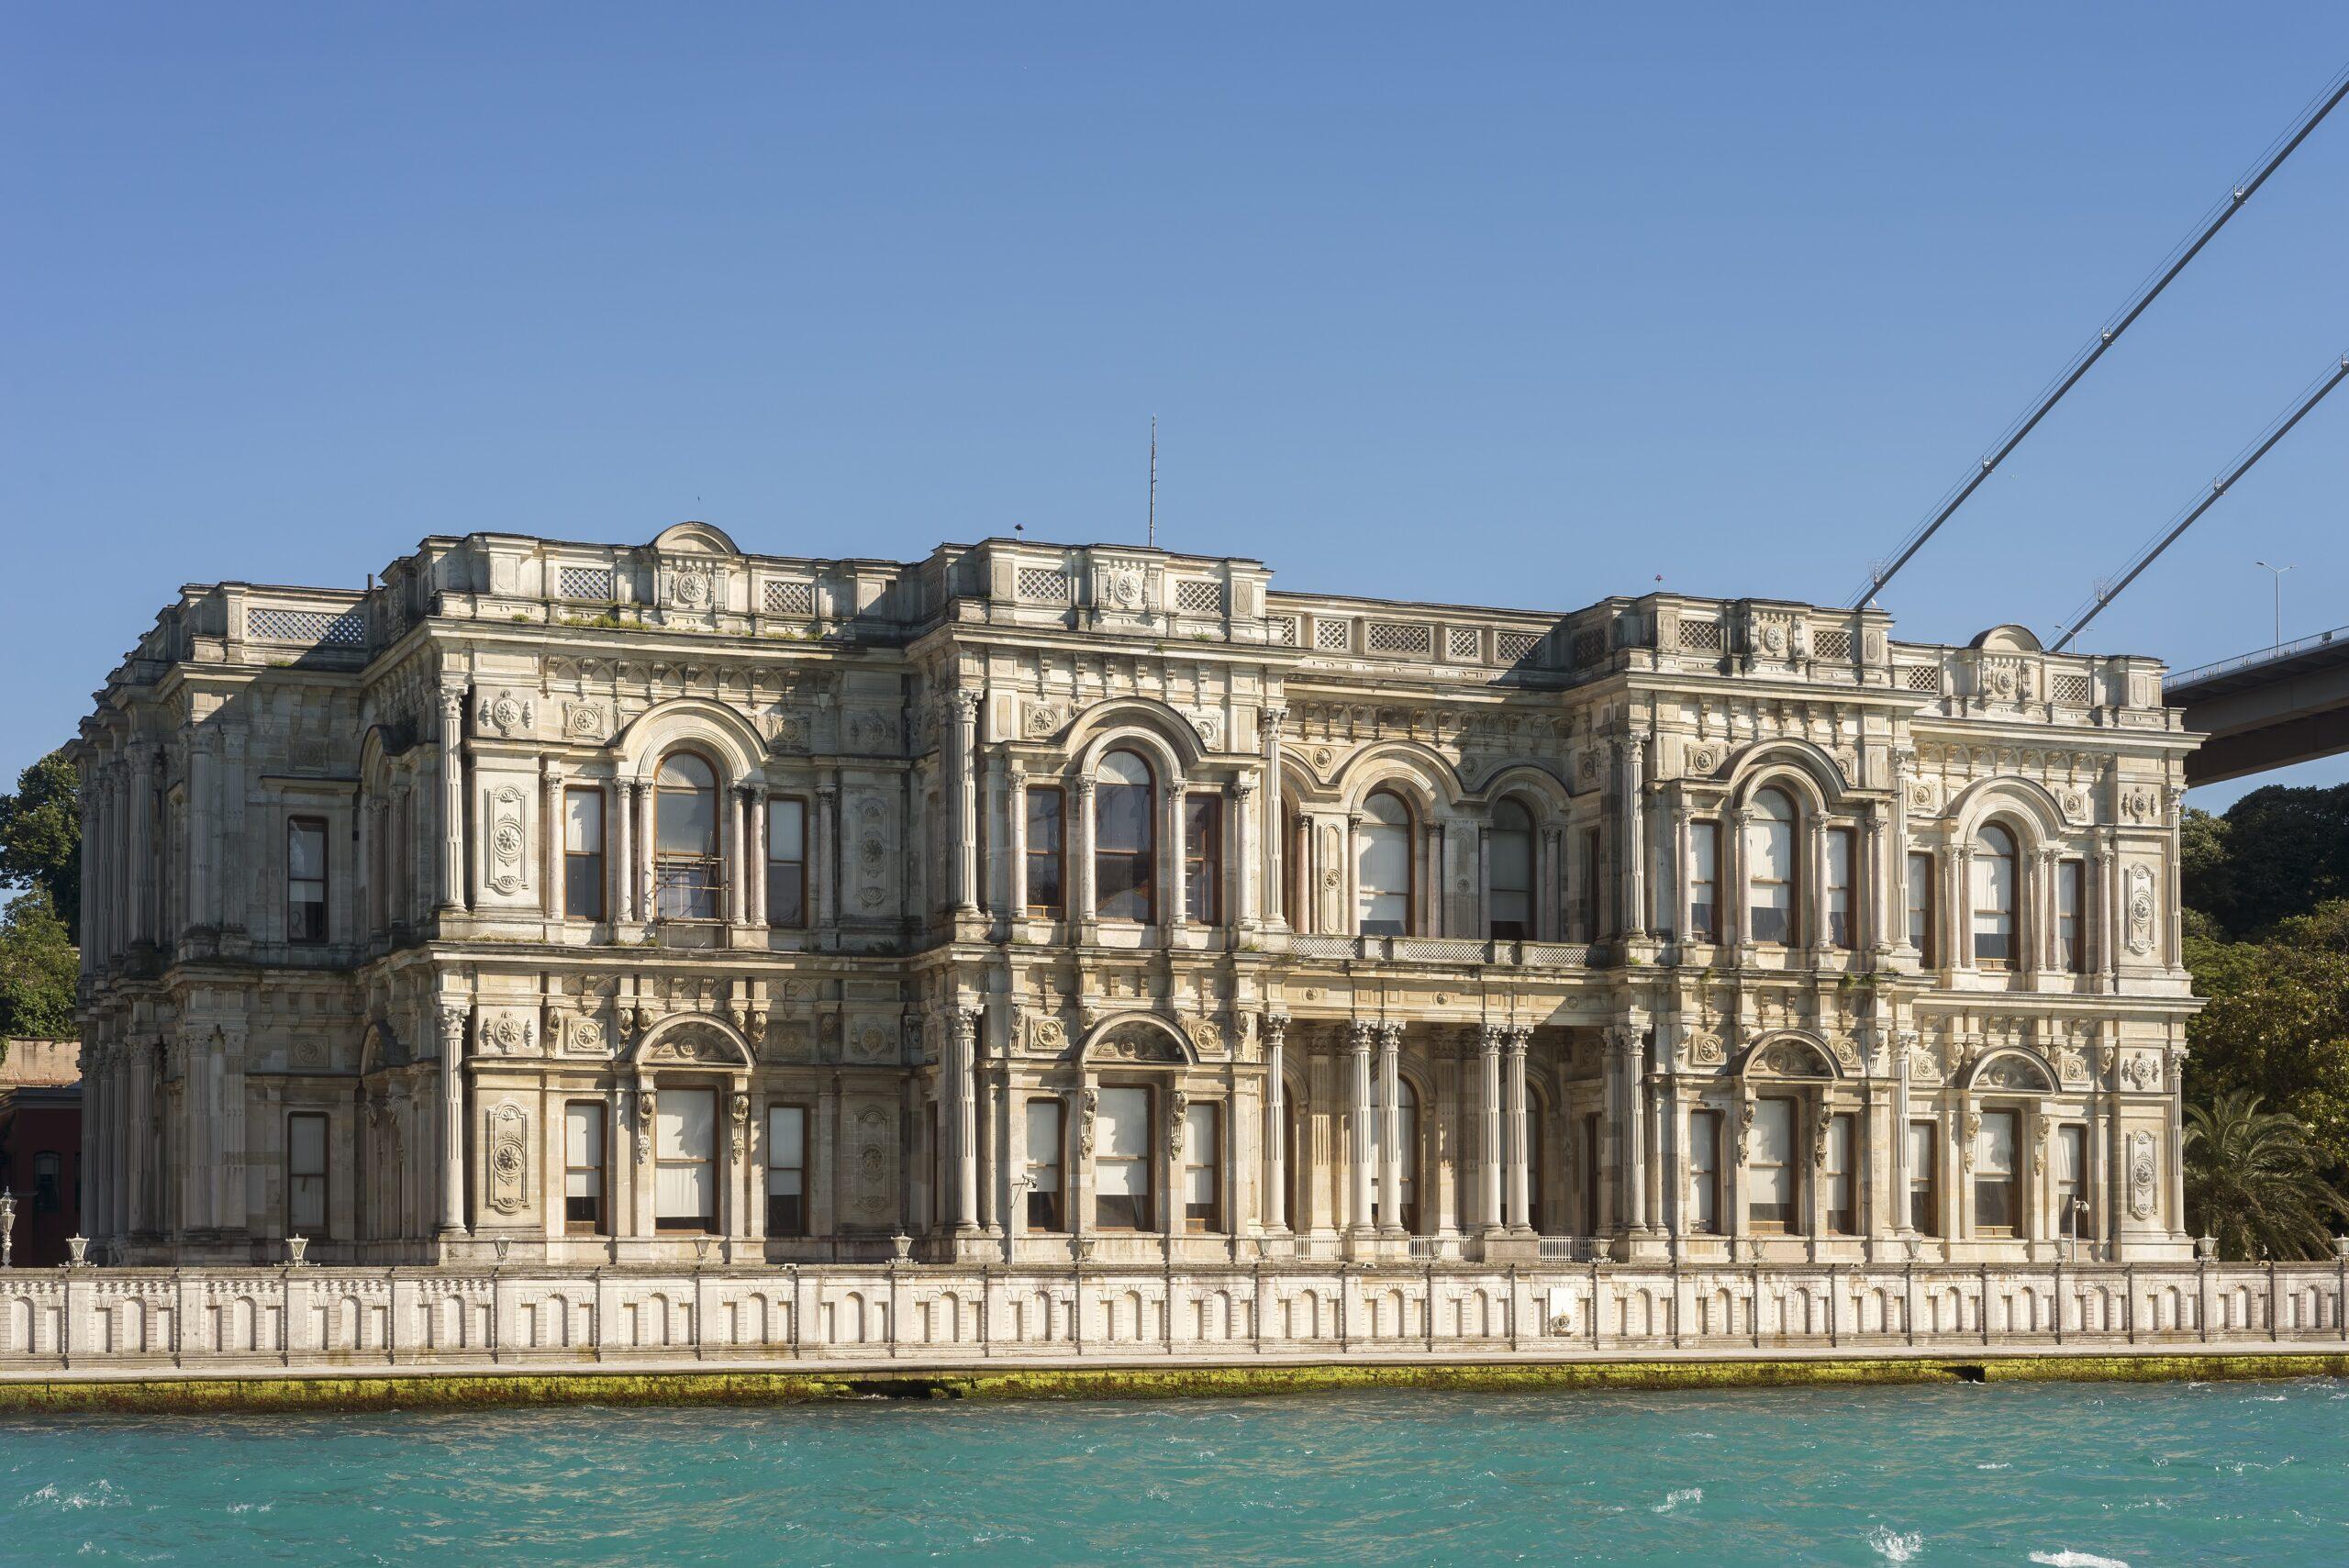 beylerbeyi palace tours